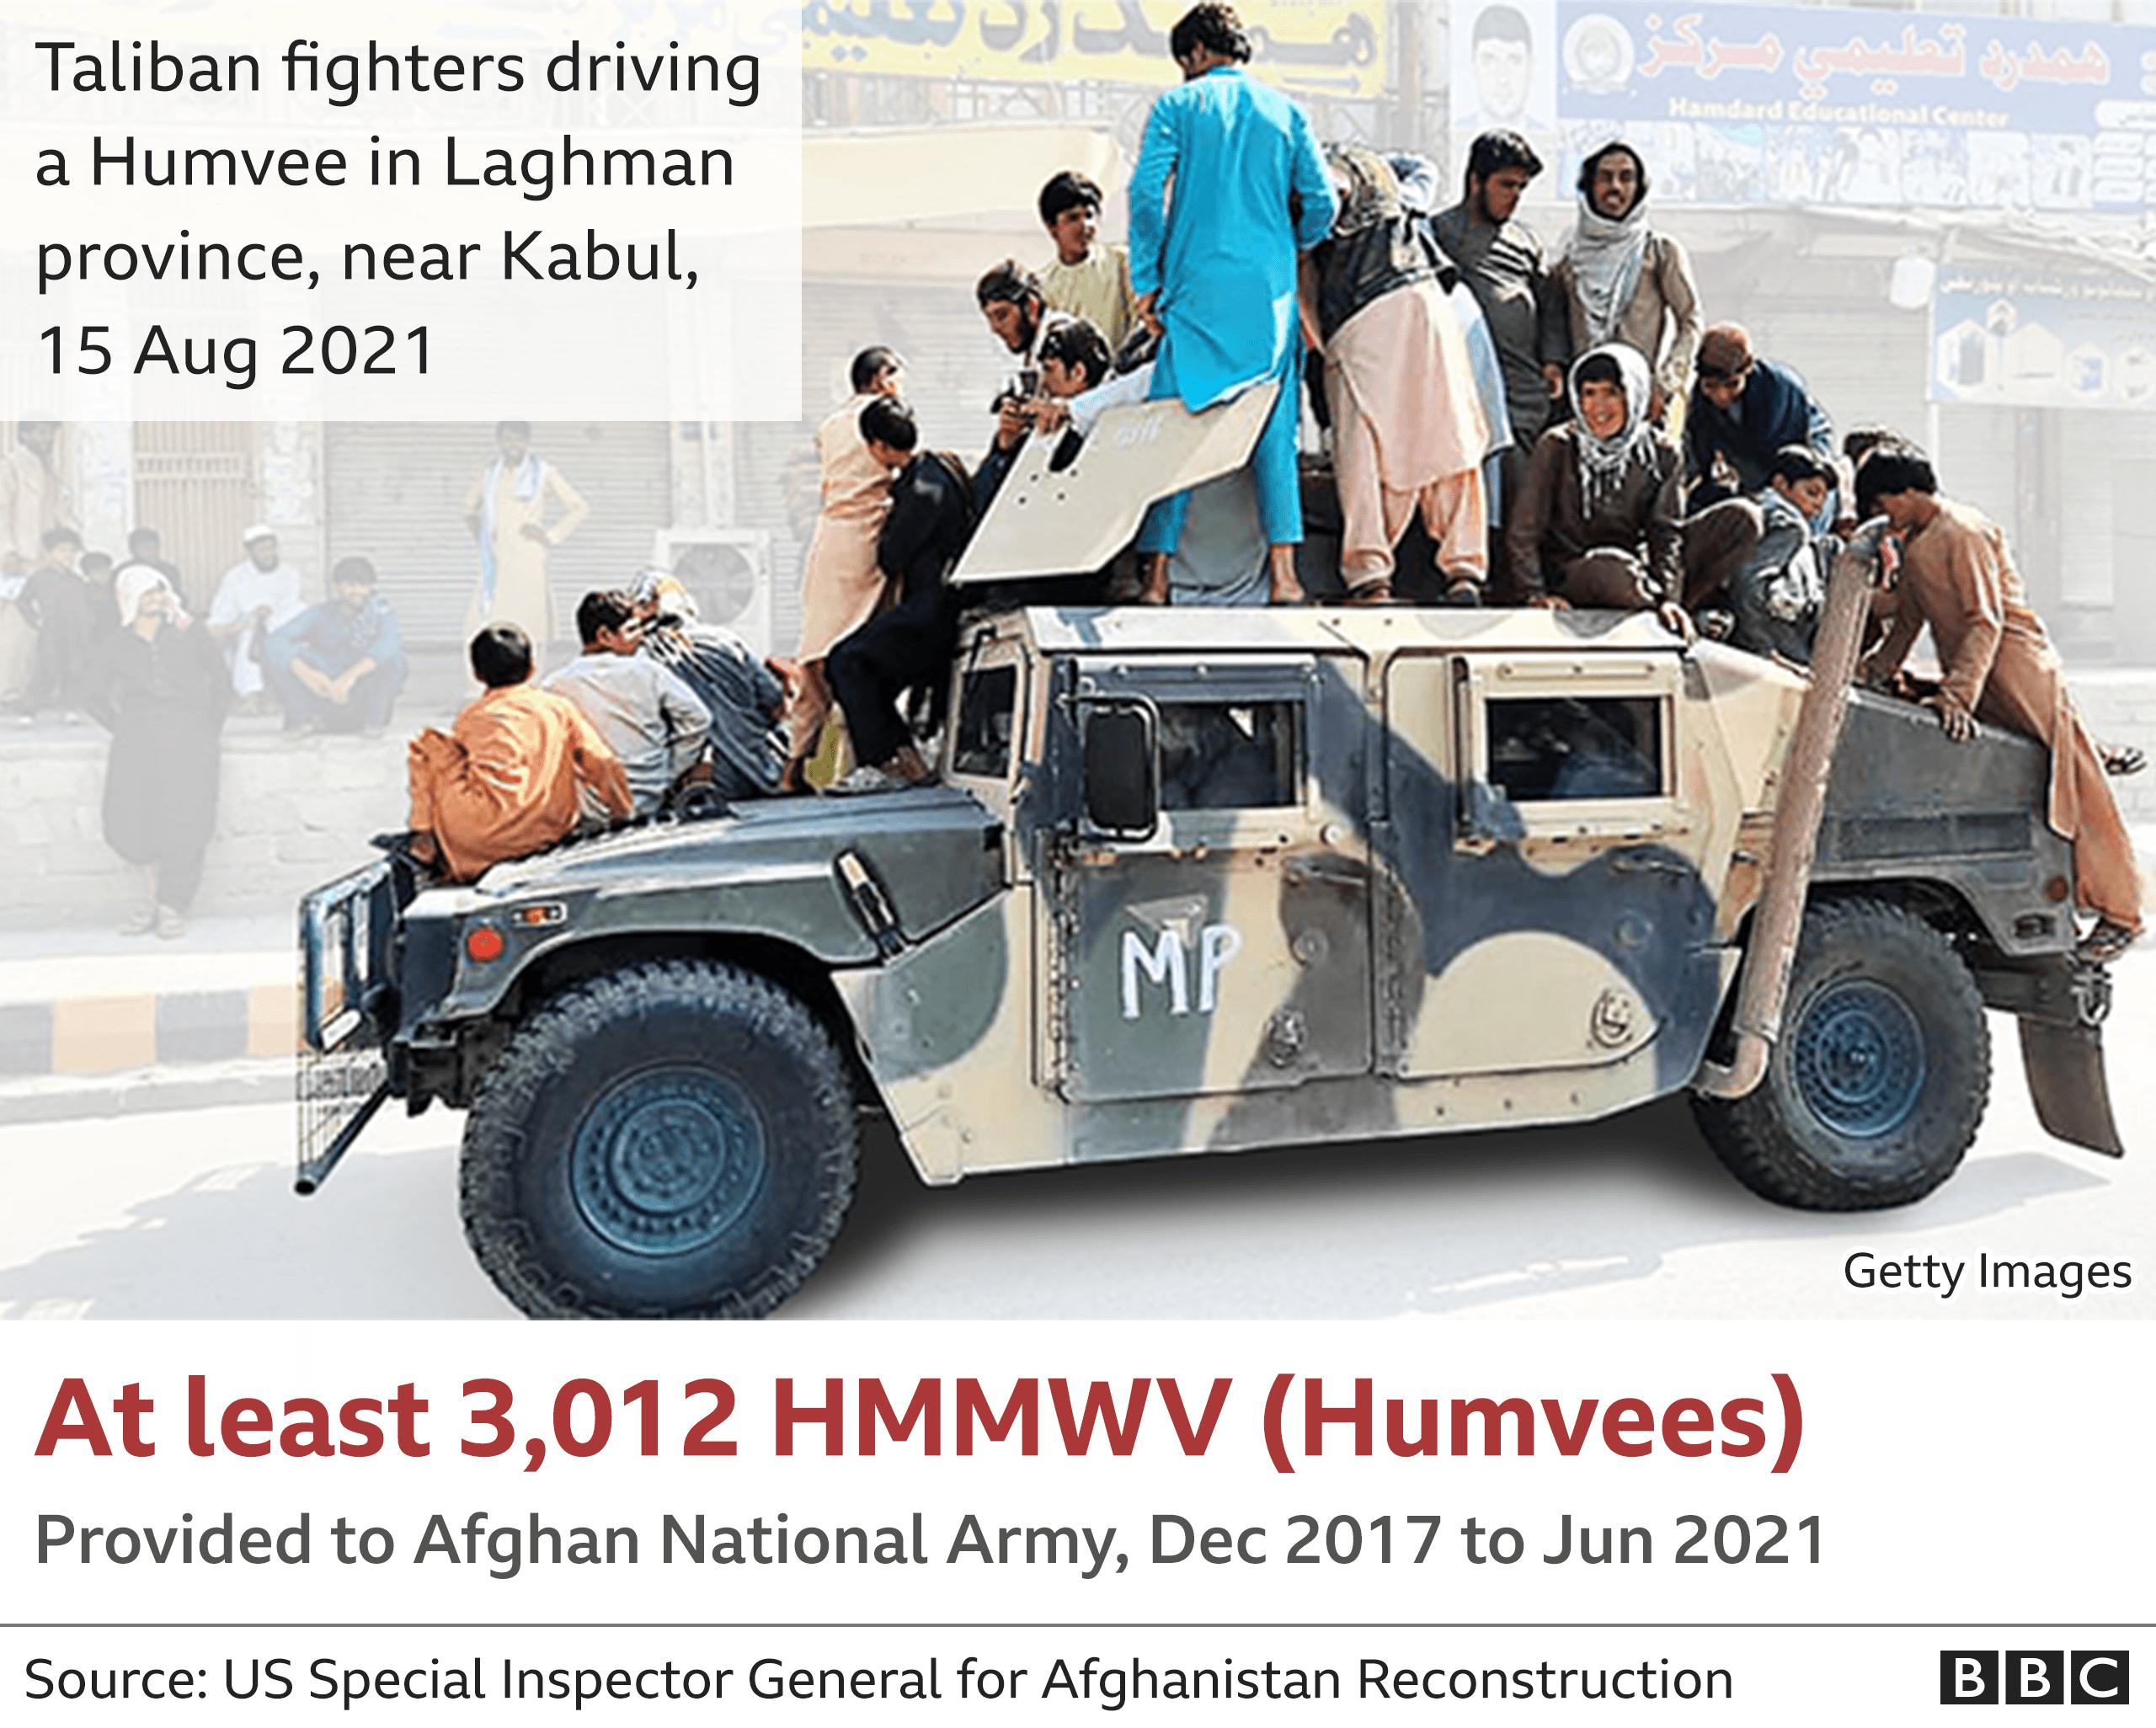 Image showing captured HMMWV (Humvee). Updated 27 Aug